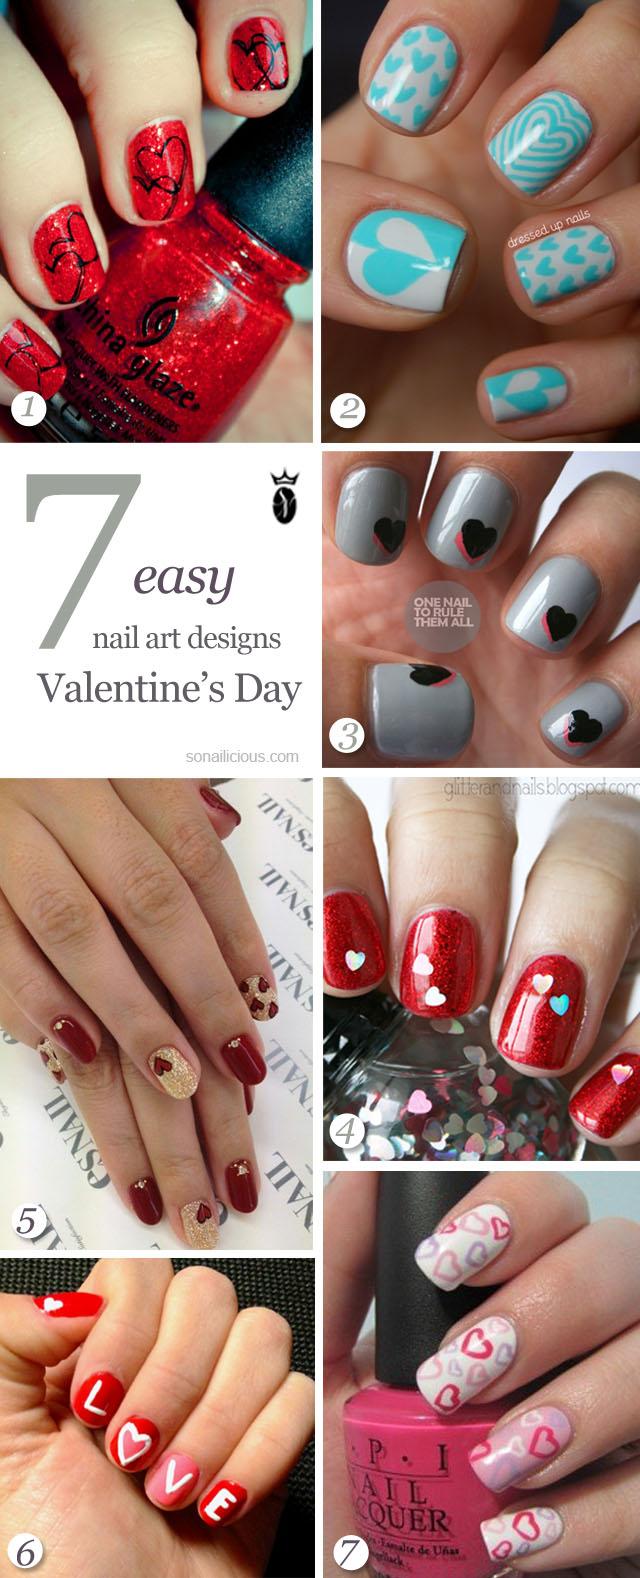 Valentine\u0027s Day nails 7 easy nail designs